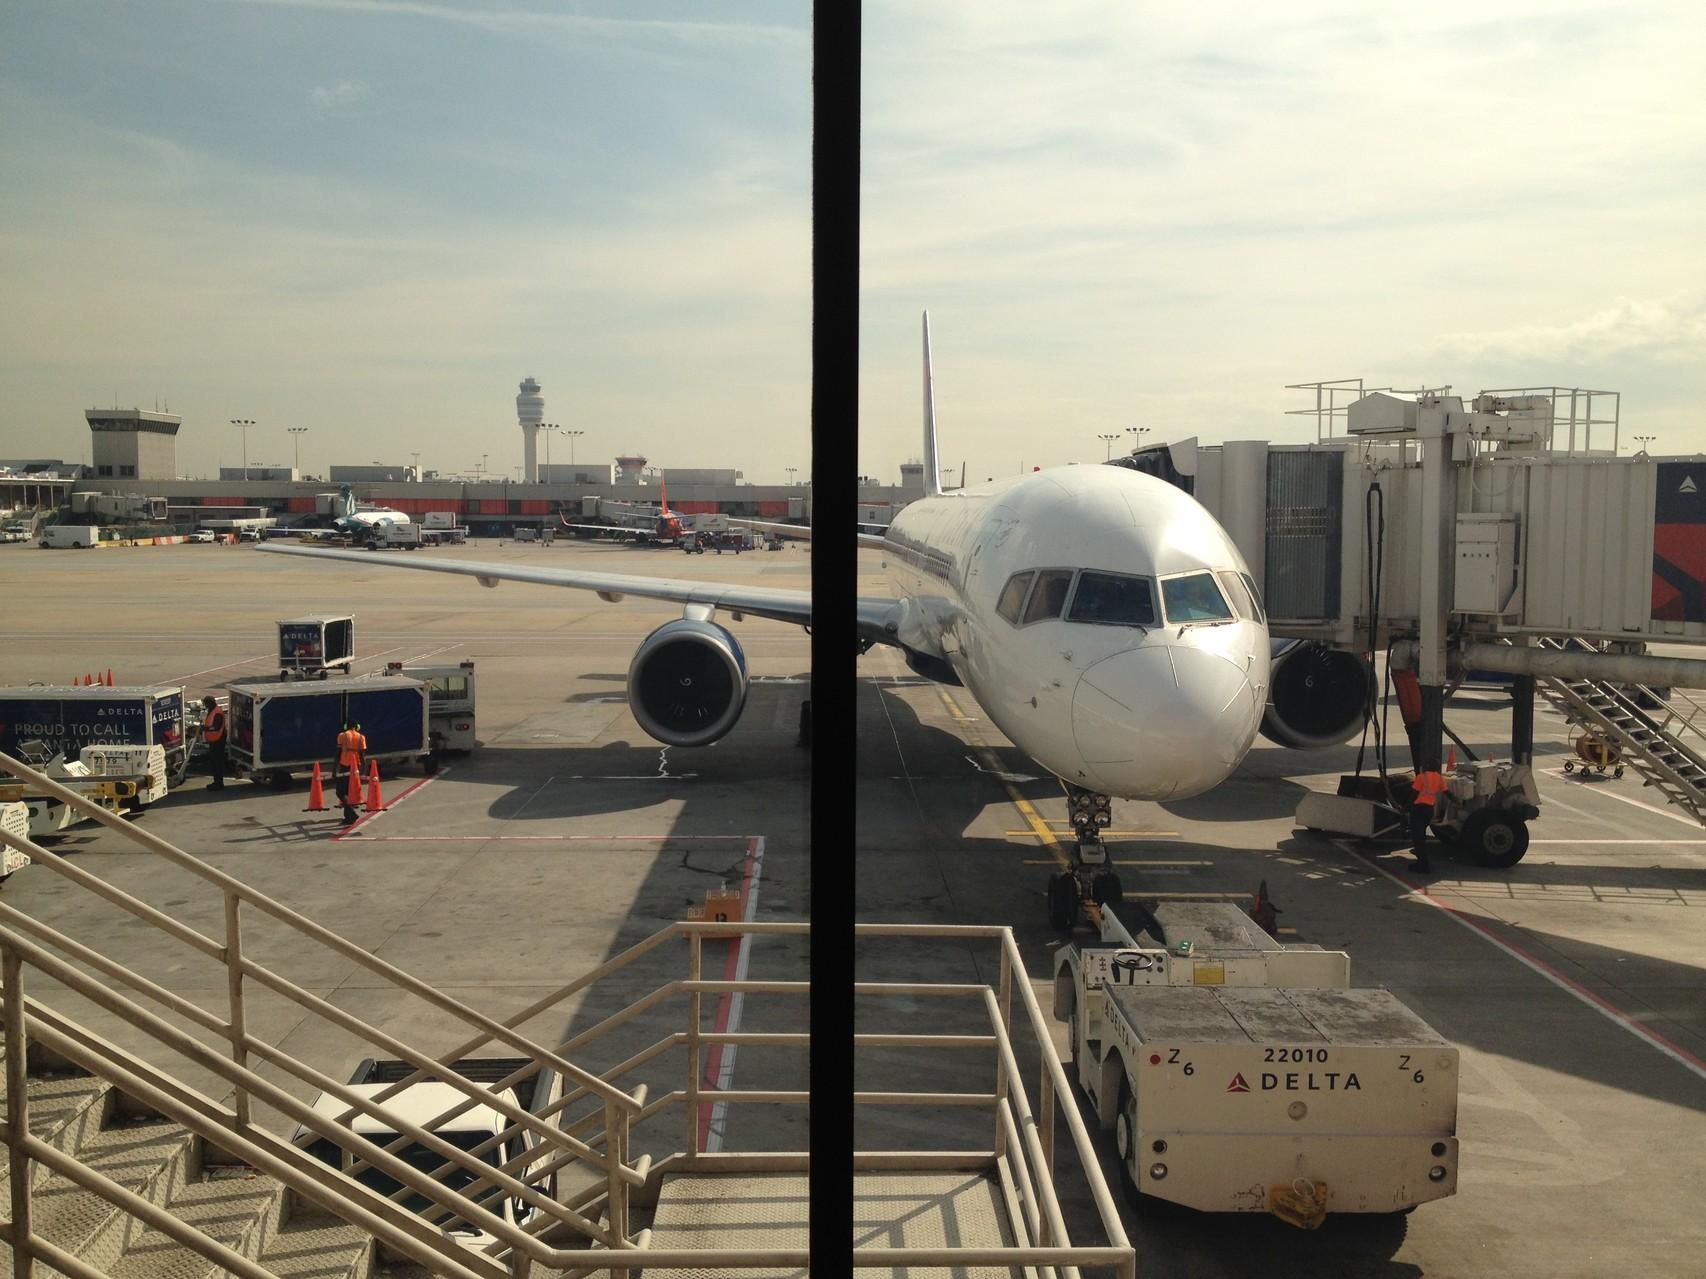 Flughafen in Atlanta, Georgia. Das ist mein Flugzeug nach Florida.